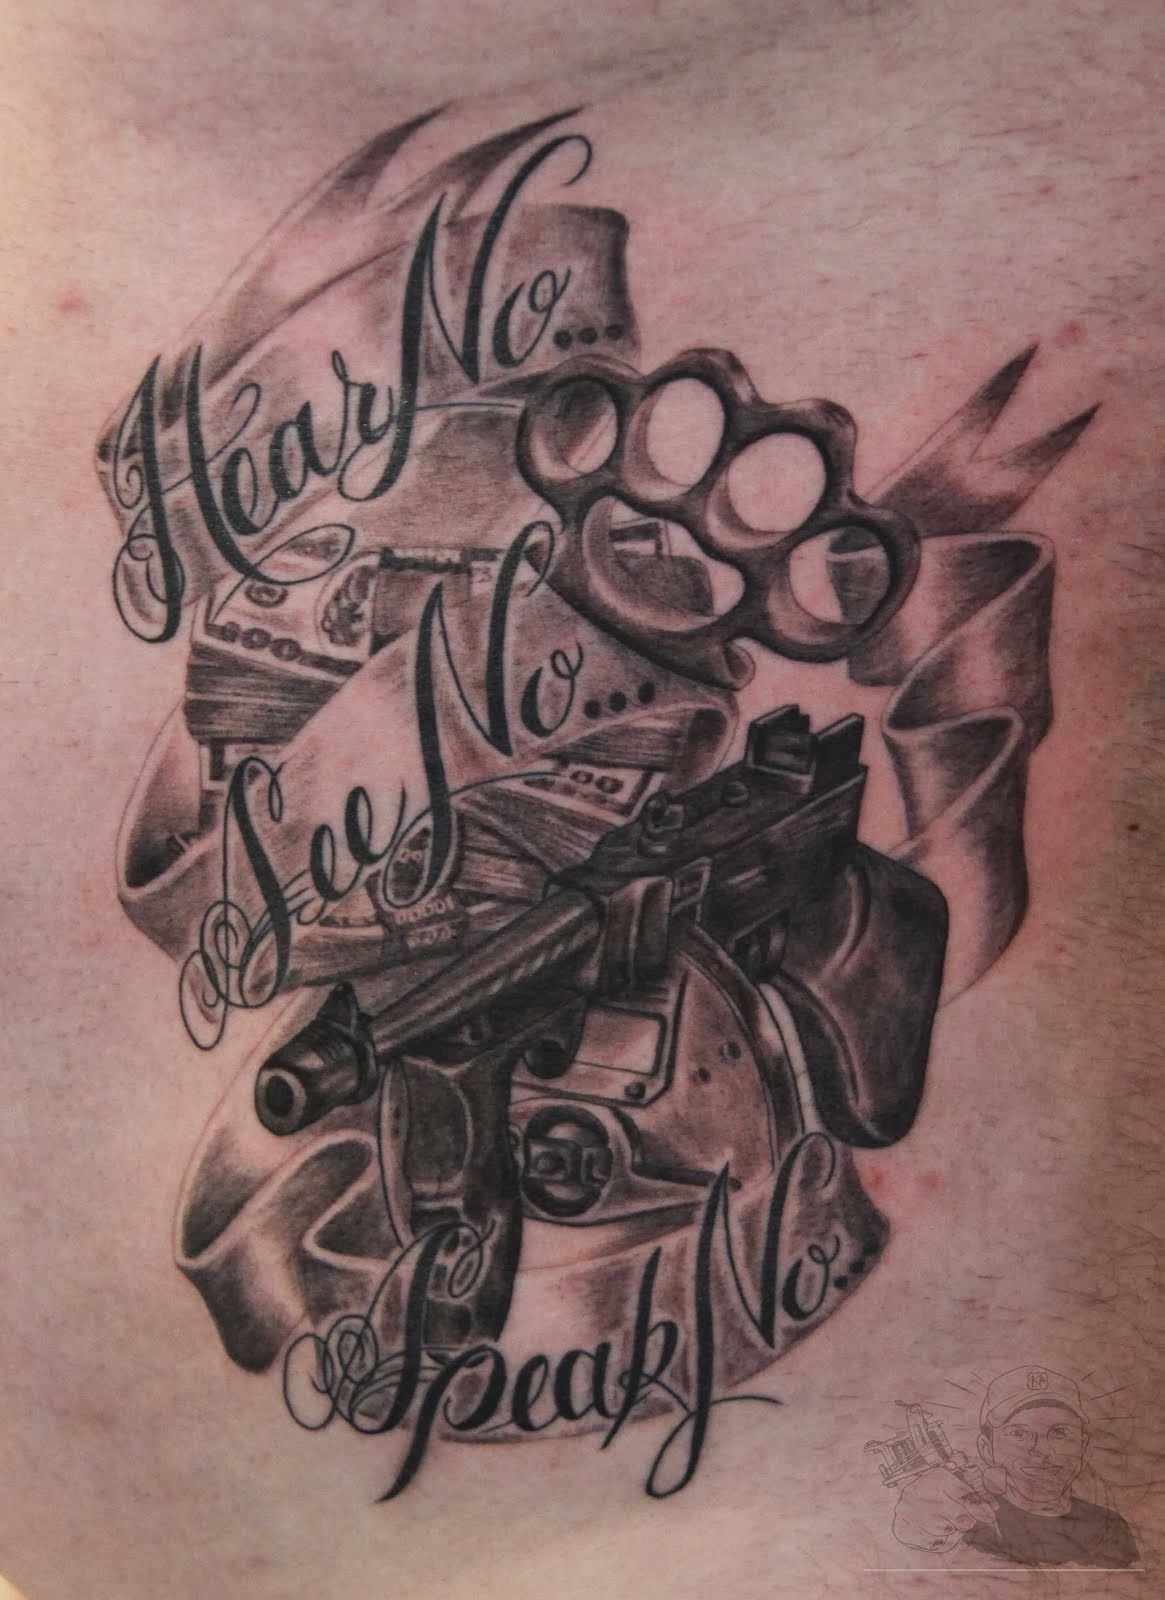 Gangsta Tattoos Gangsta Tattoos Gangster Tattoos Tattoo Lettering